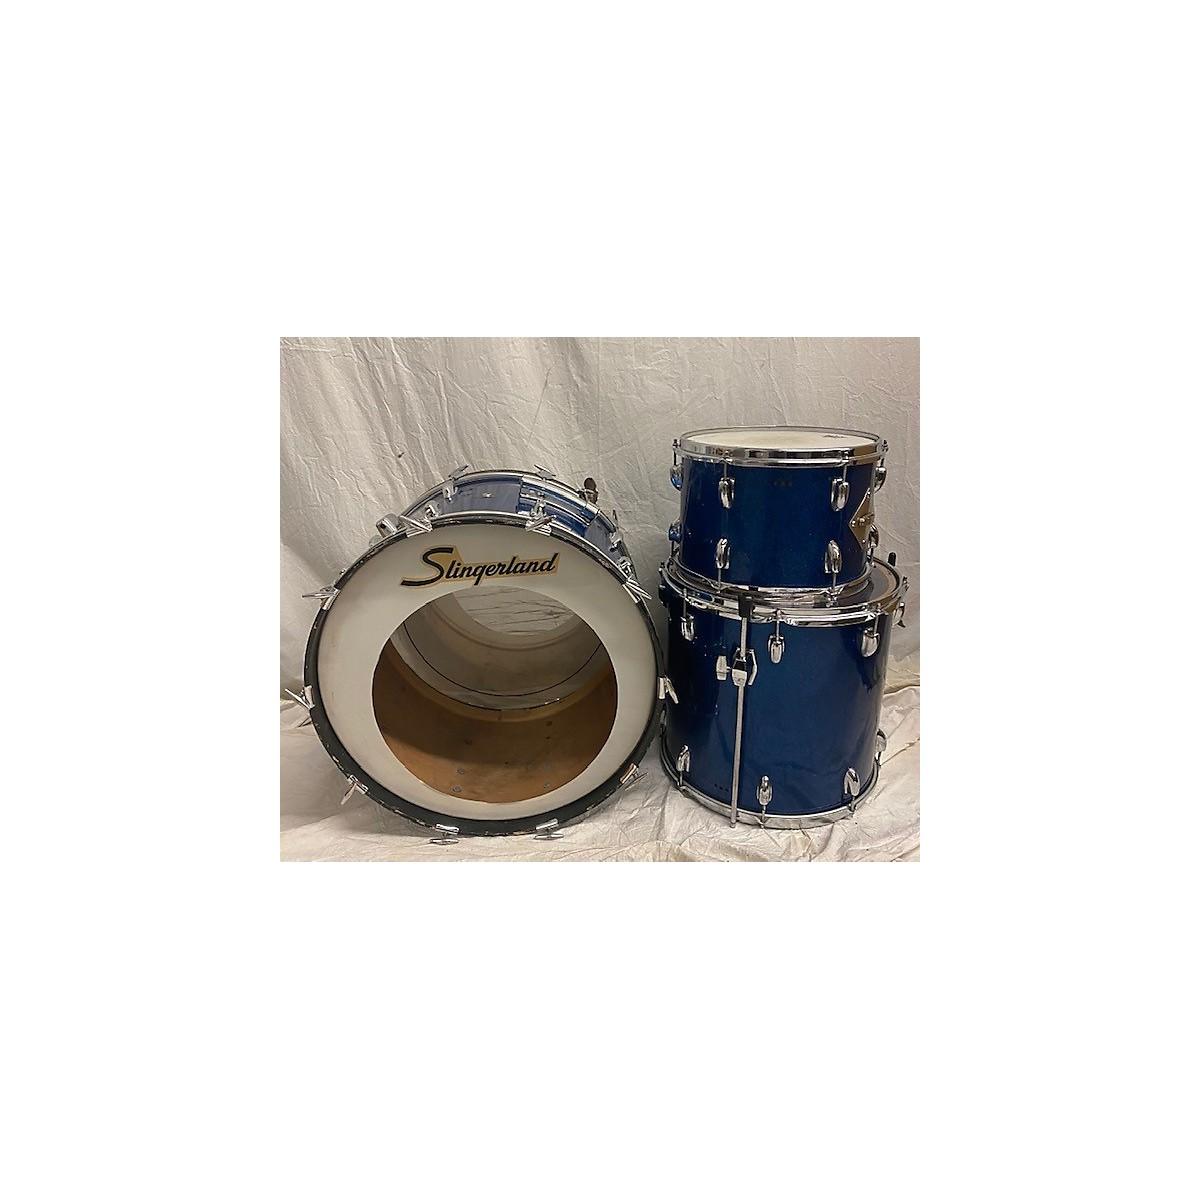 Slingerland 1960 3 Piece Kit Drum Kit